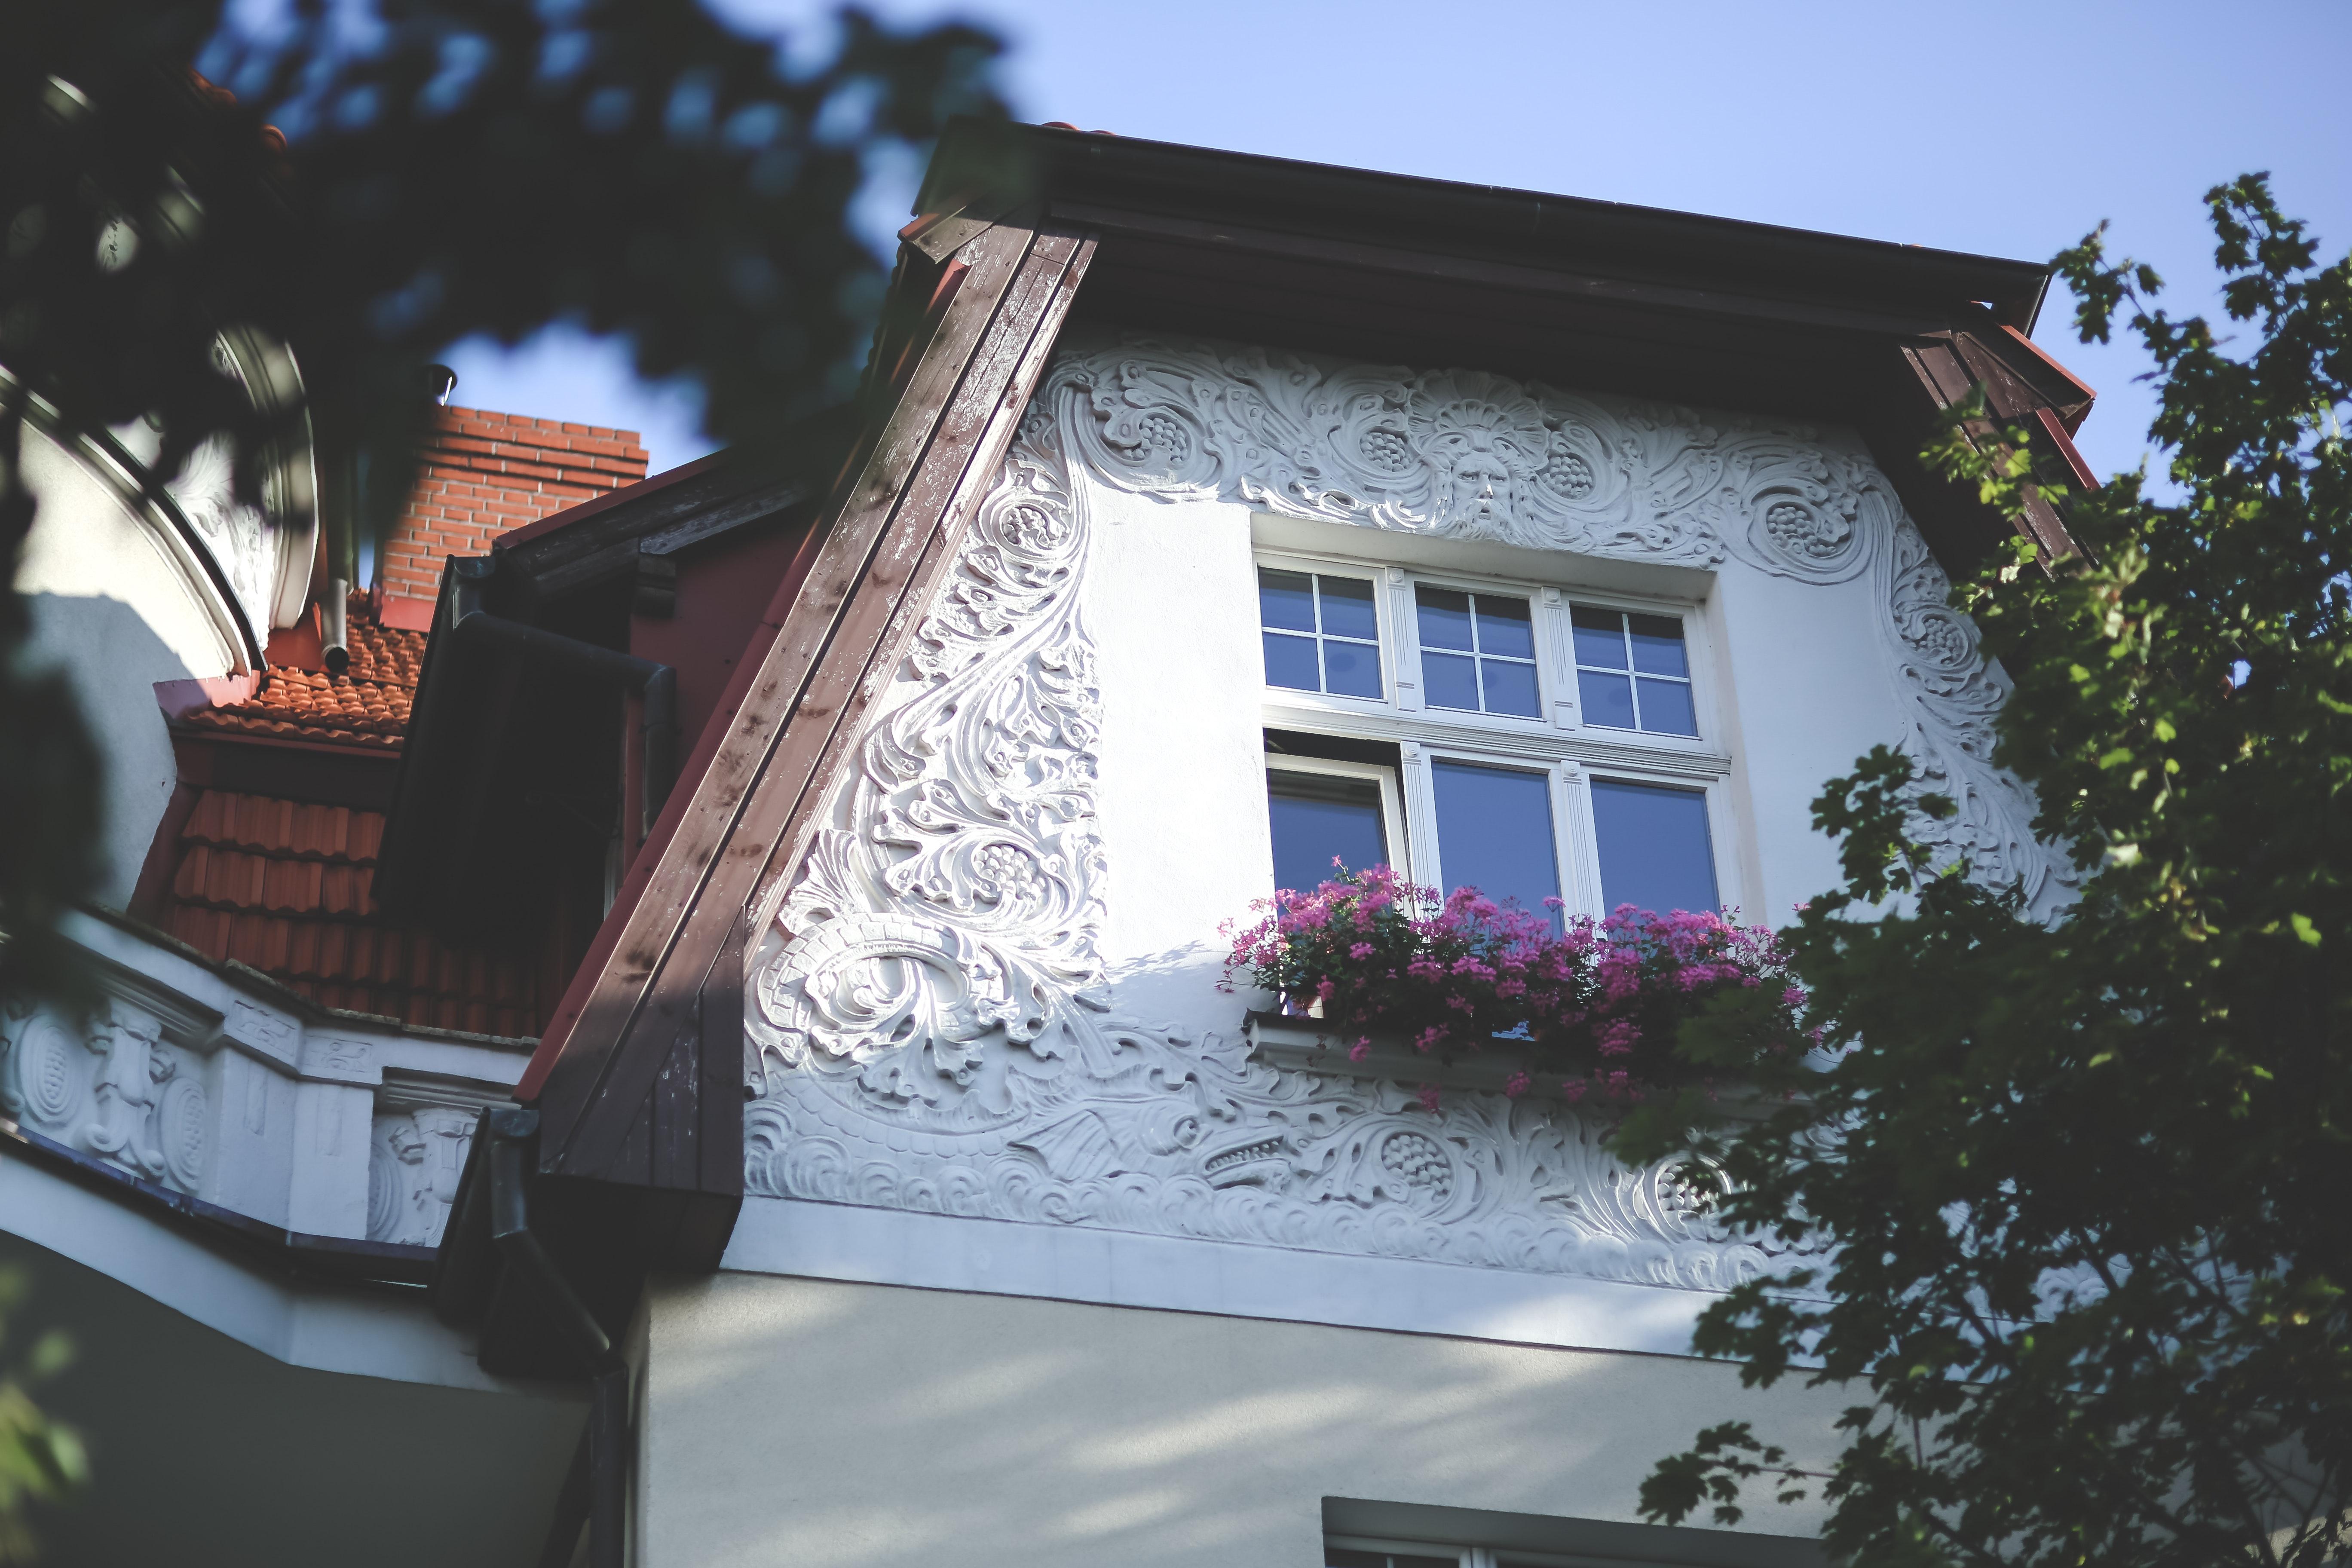 Old building, Architecture, Ornaments, Window, White, HQ Photo